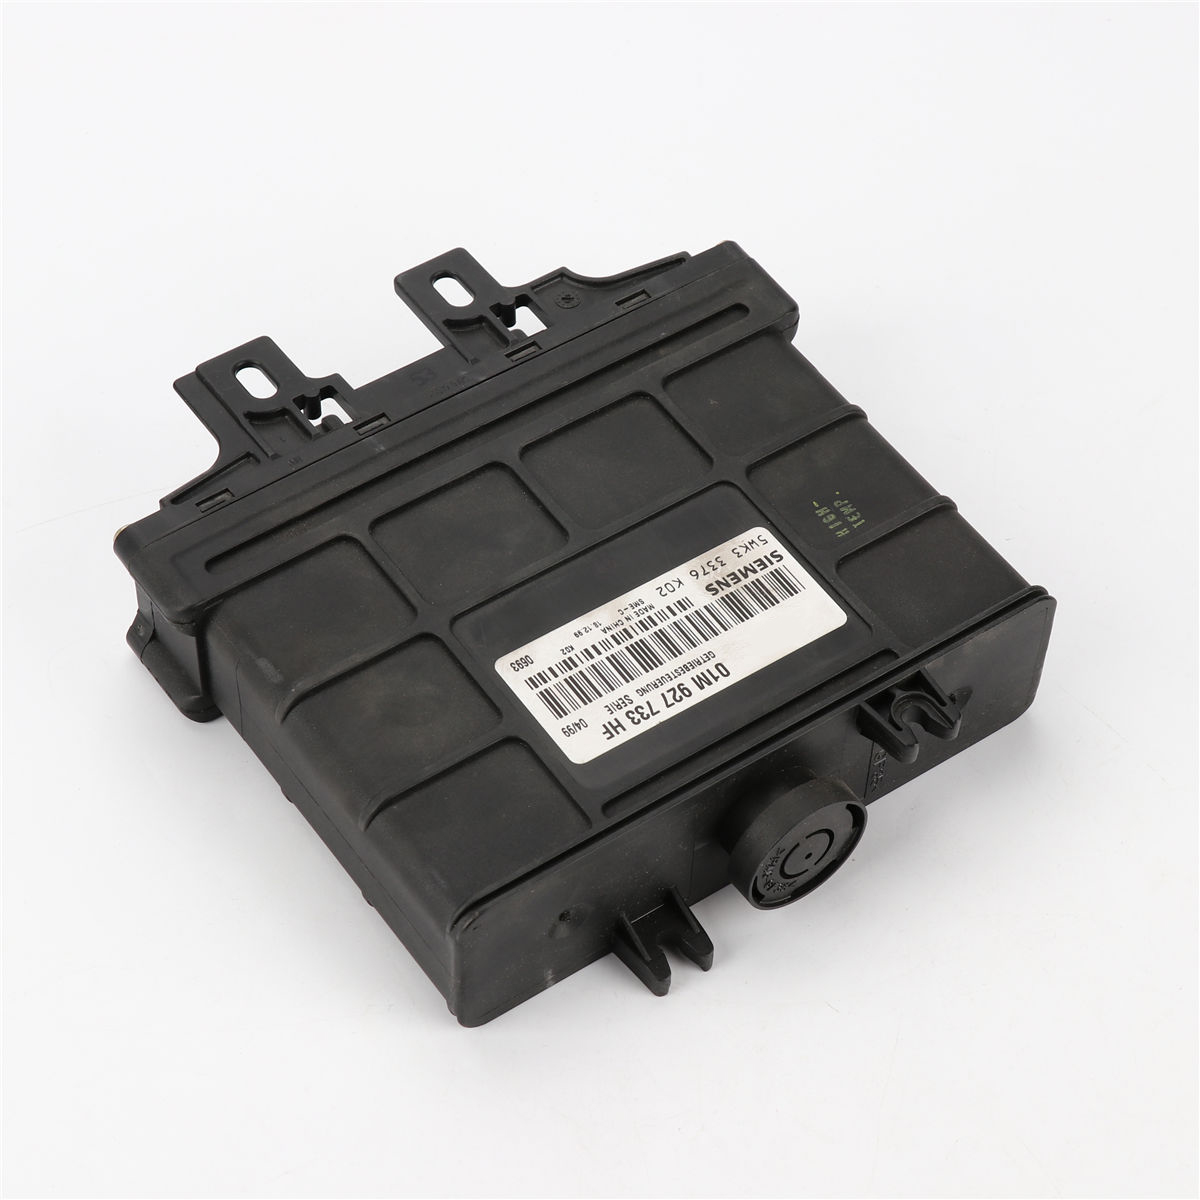 1pc New Automatic Gearbox Control Unit for VW Bora Golf AUDI A3 Octavia 01M 927 733 HF golf 3 td 2011